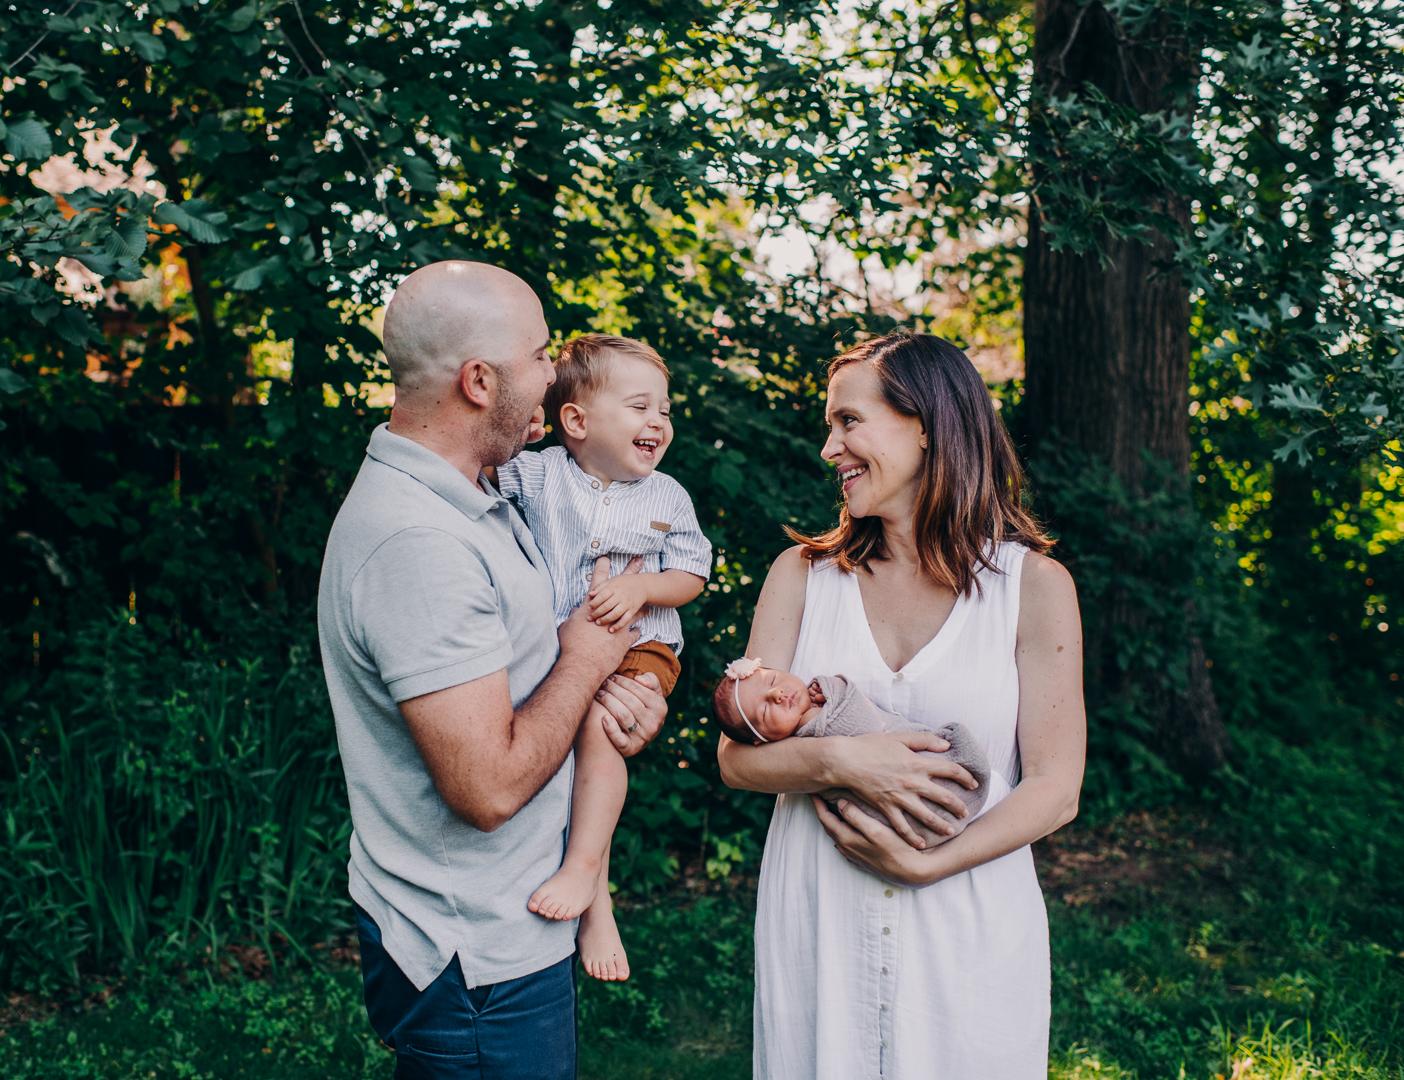 TerraSuraPhotography-Sloane Vasseur Family Newborn-Web-4976.jpg